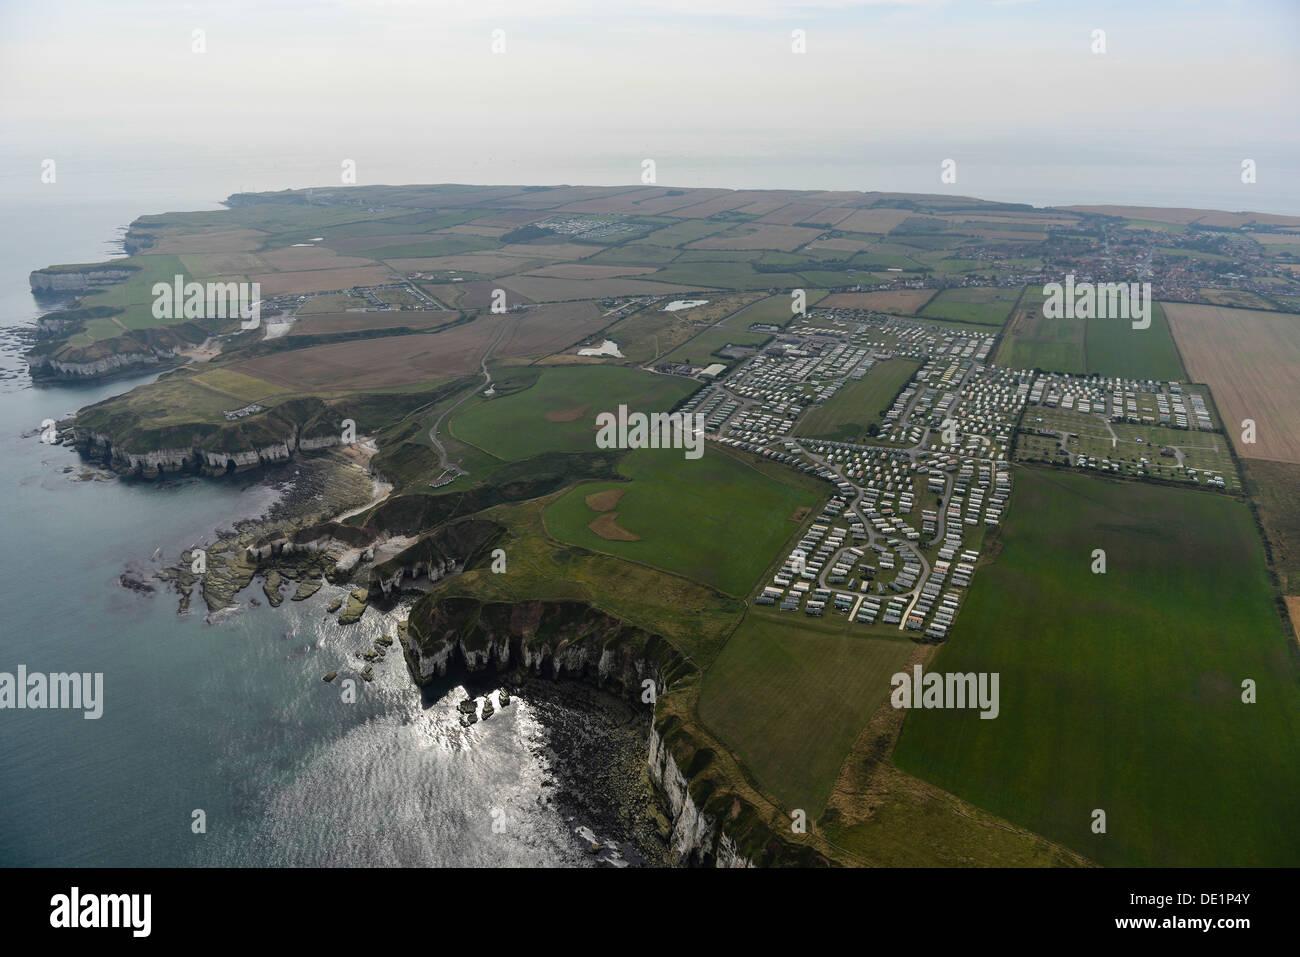 Aerial photograph of Yorkshire coast near Flamborough Head - Stock Image